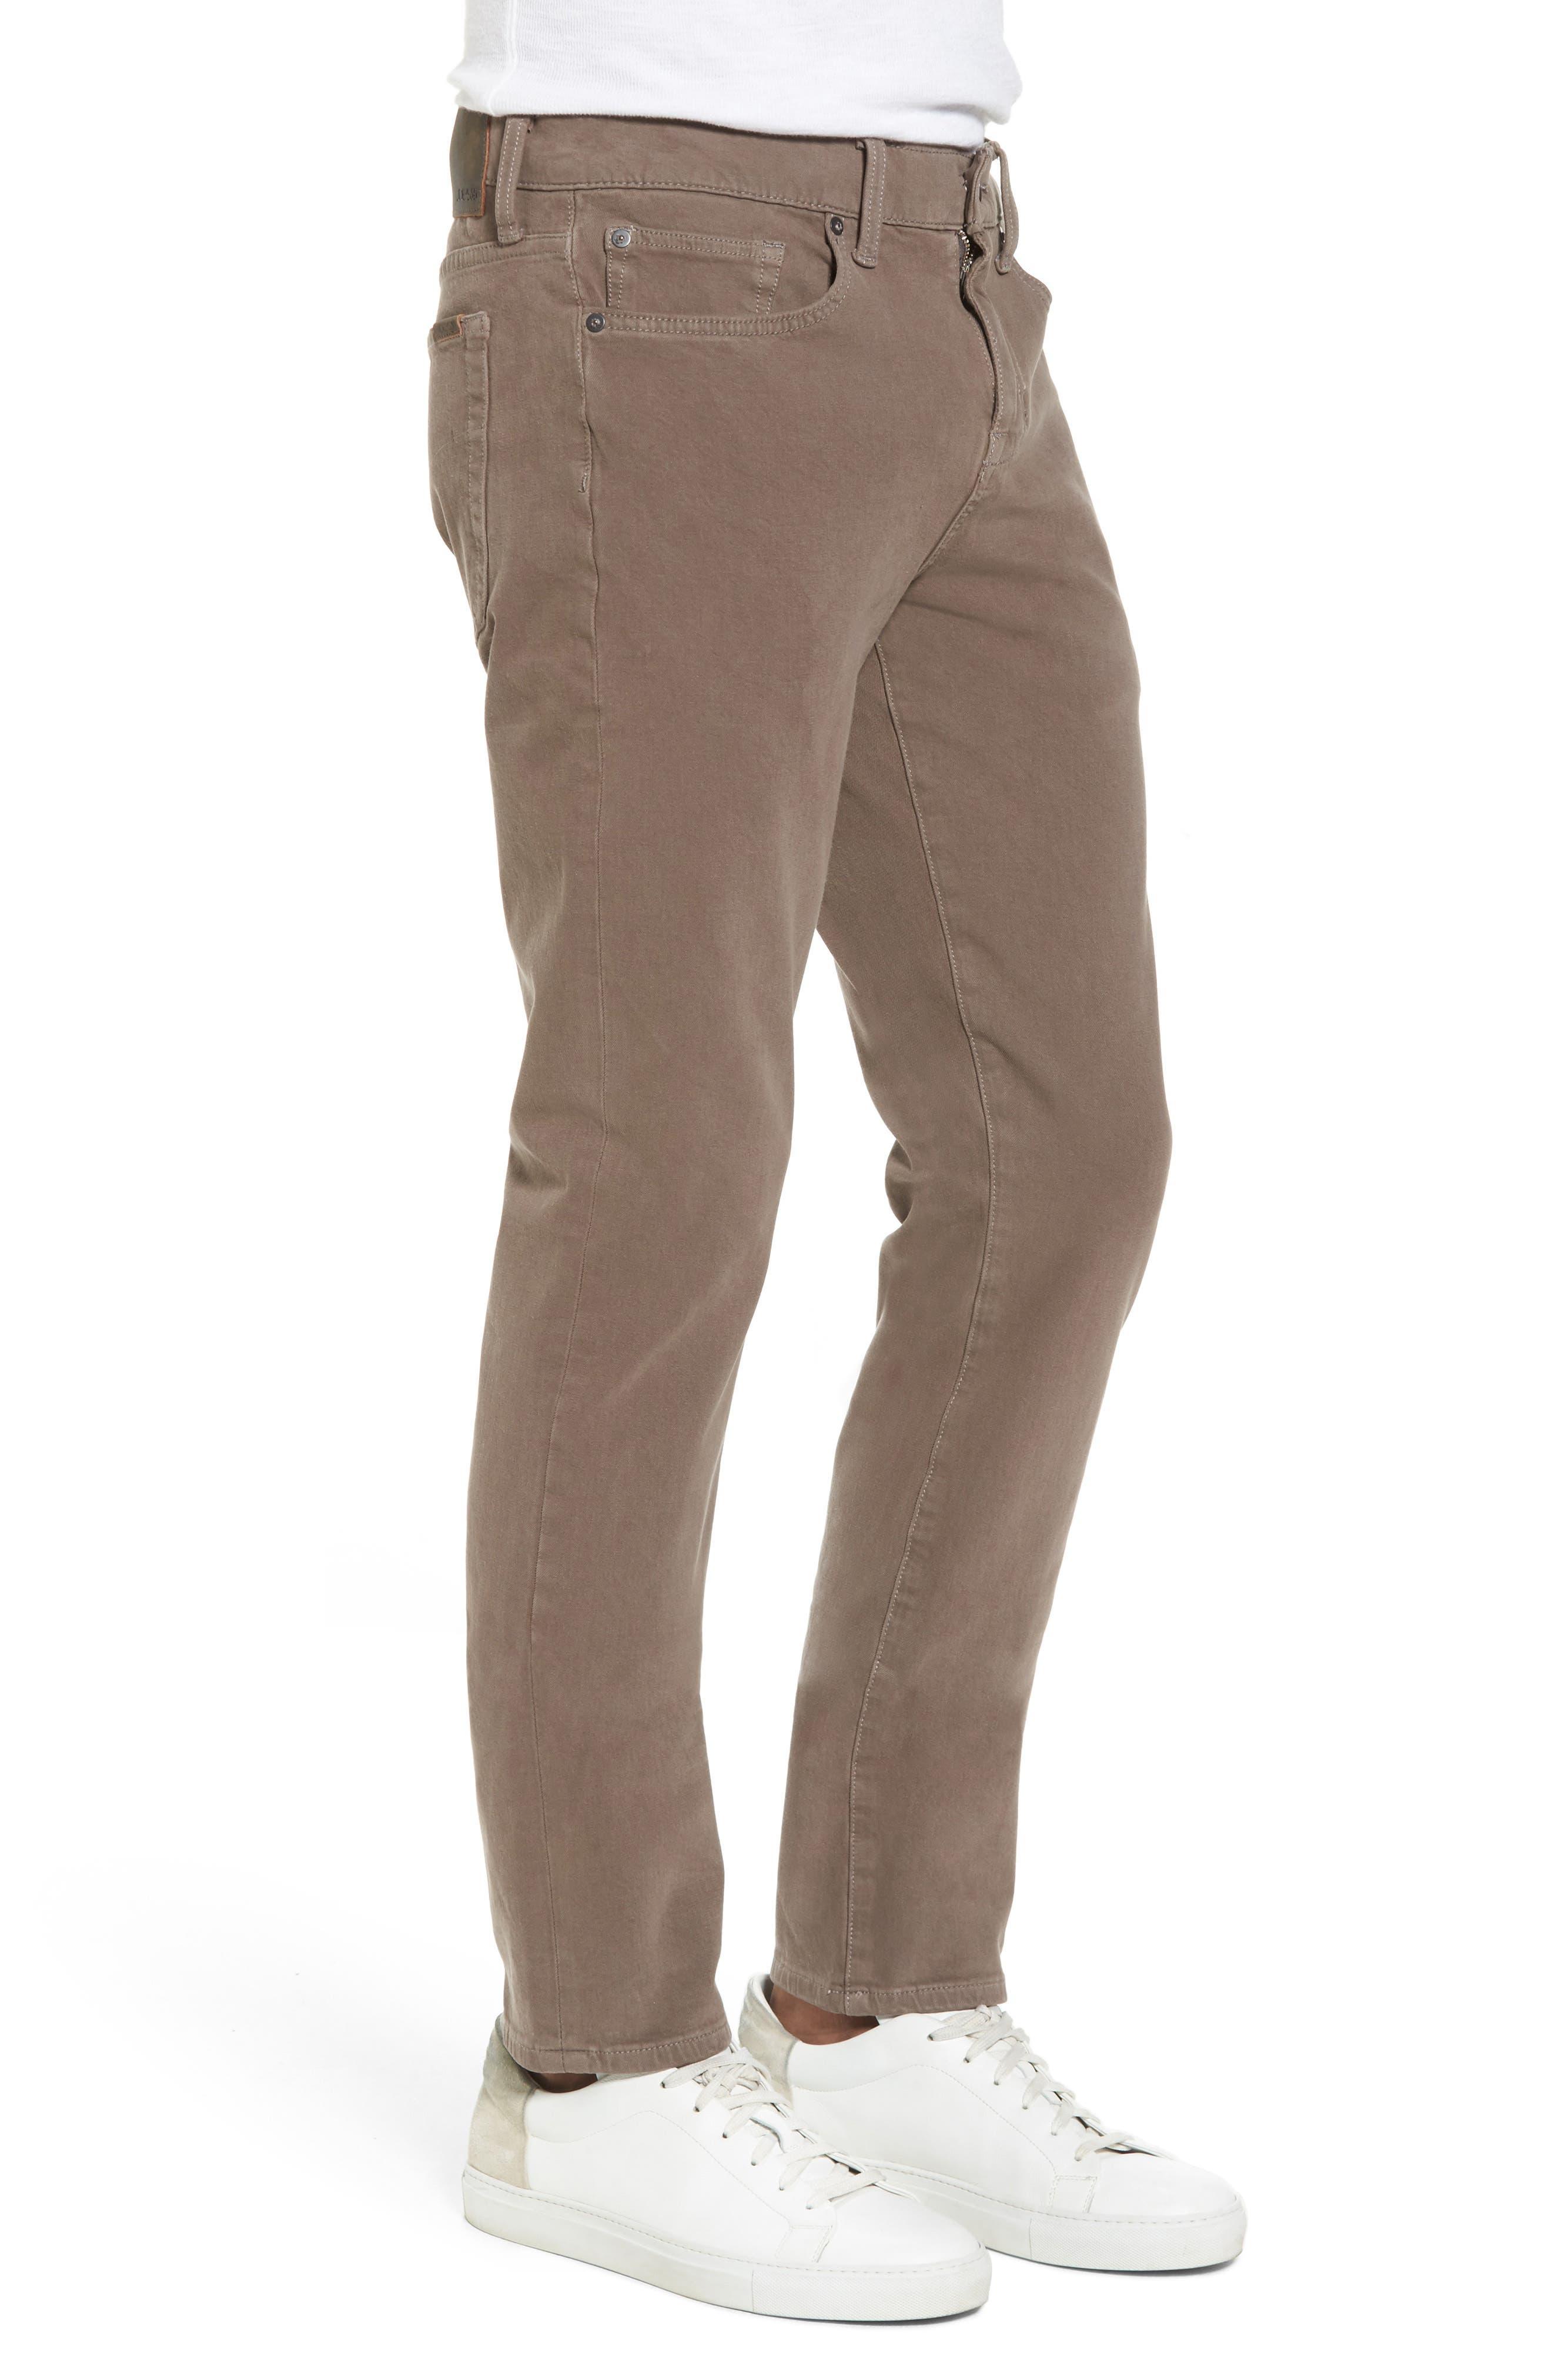 Kinetic Slim Fit Jeans,                             Alternate thumbnail 3, color,                             Stonehenge